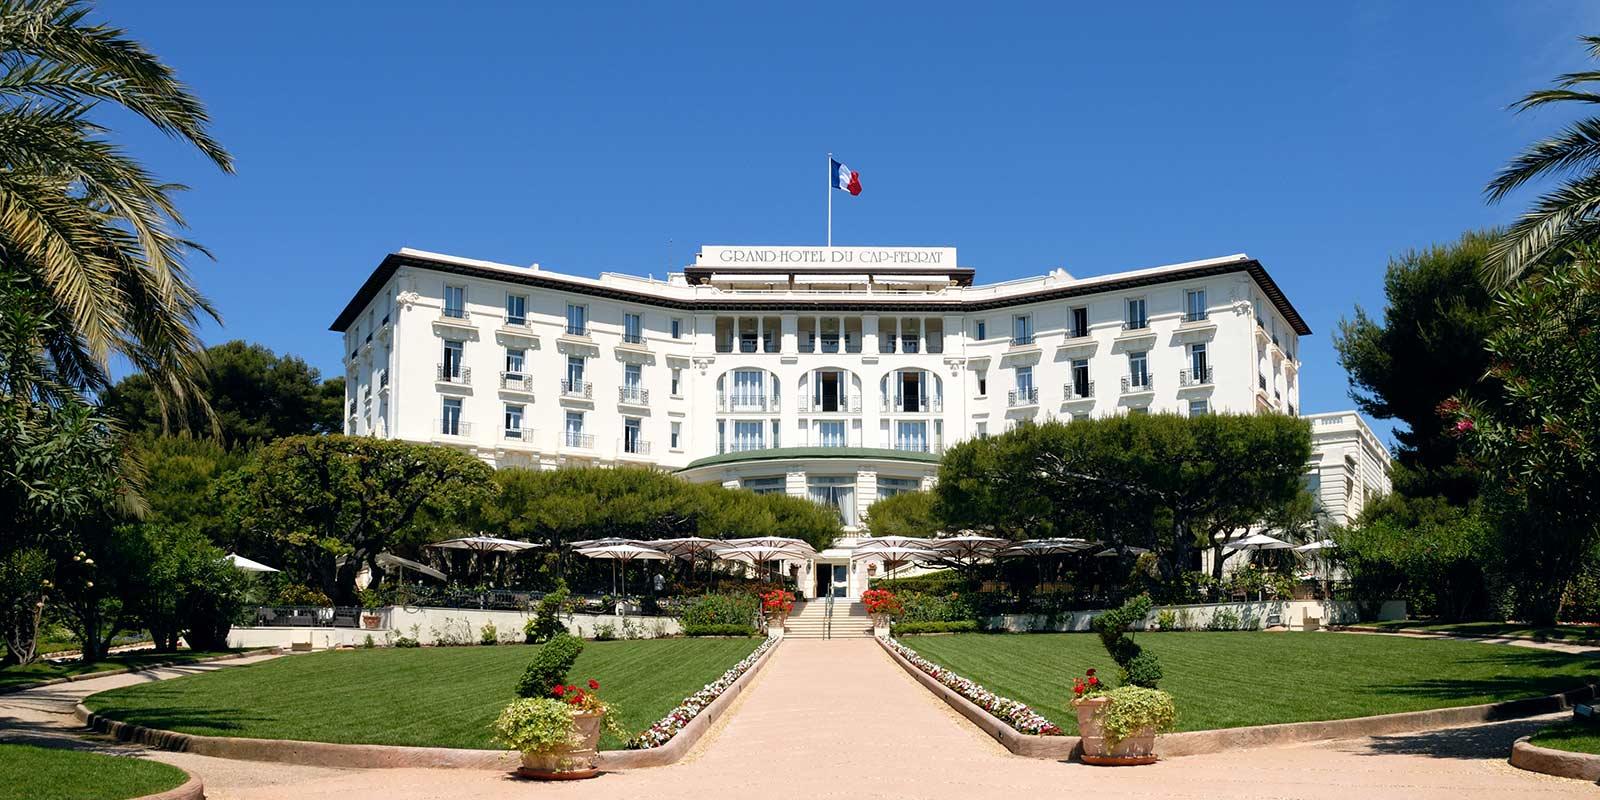 Hotel du Cap-Eden-Roc, Cap d'Antibes, France 2